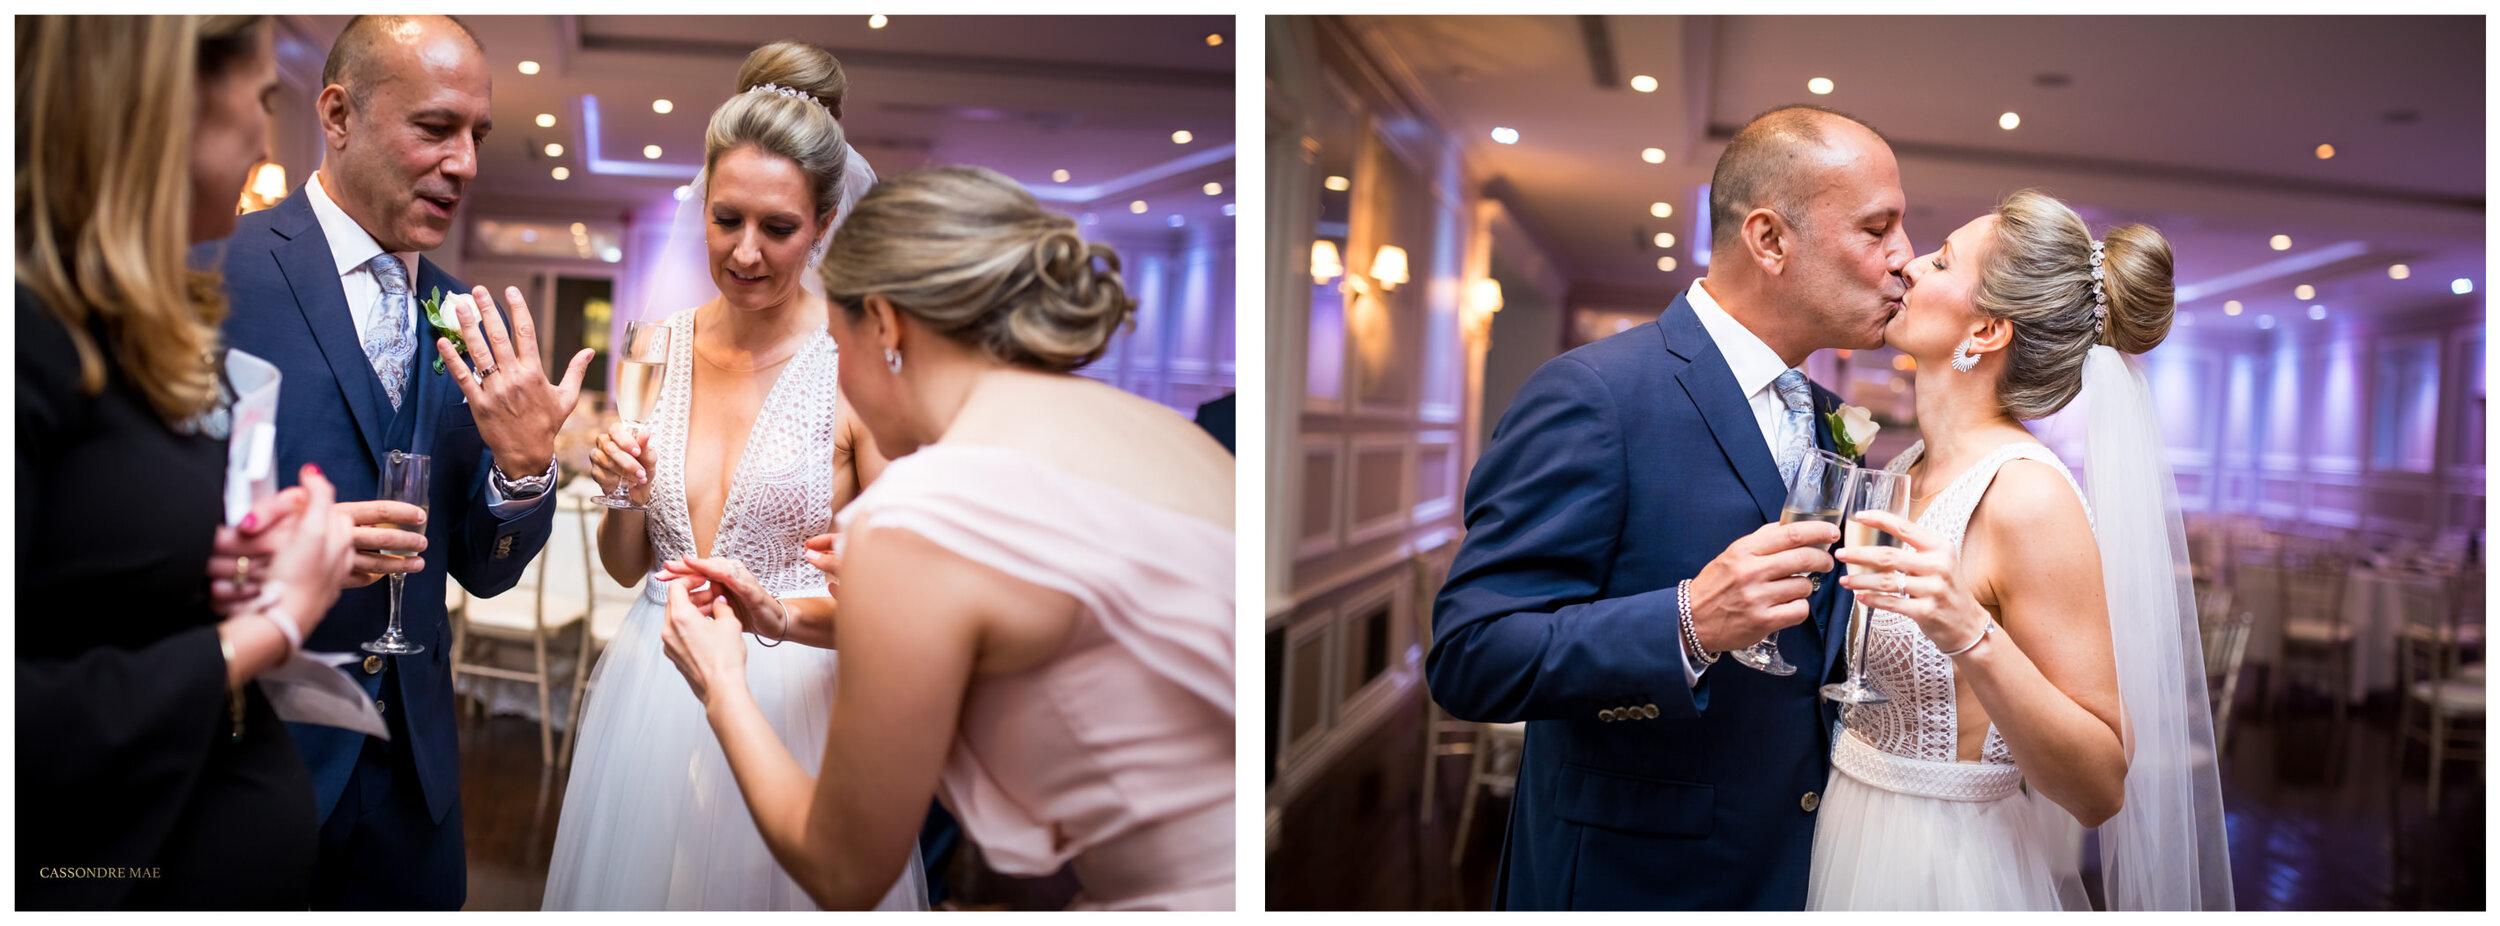 Cassondre Mae Photography Briarcliff Manor Wedding Photographer 15.jpg